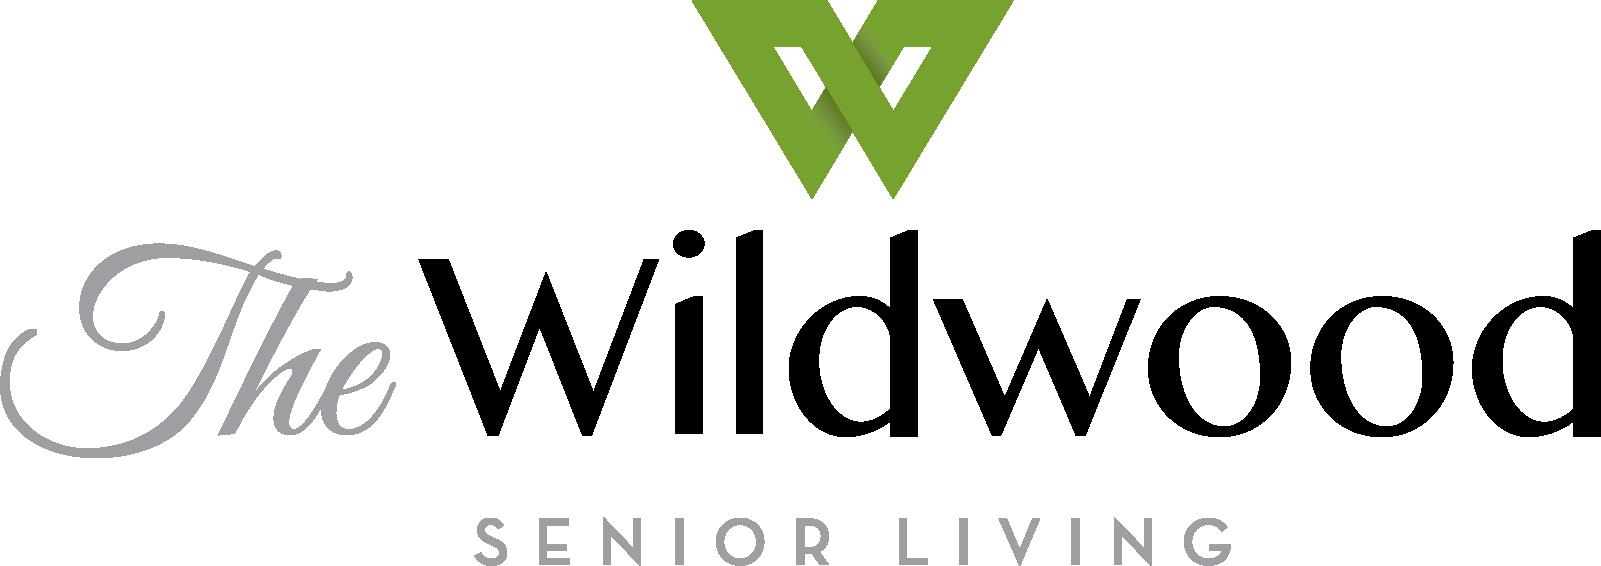 The Wildwood Senior Living